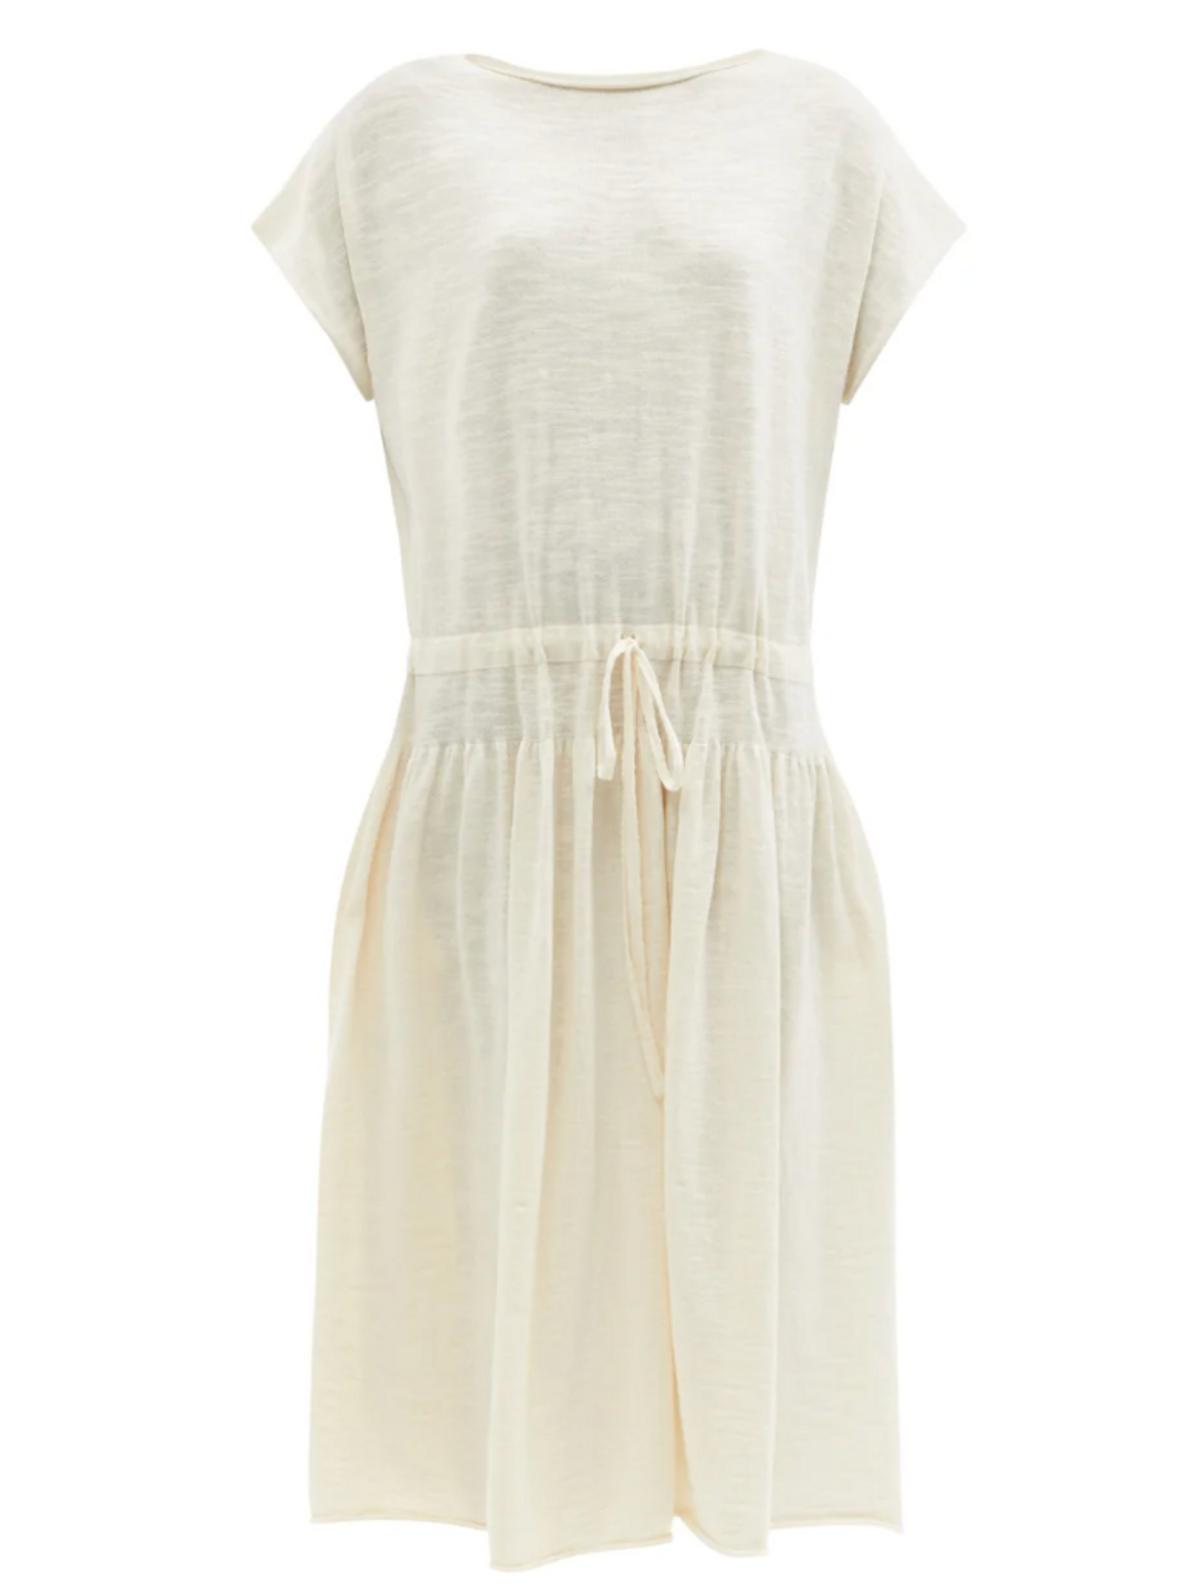 Tier Drawstring-waist Cotton-knit Dress